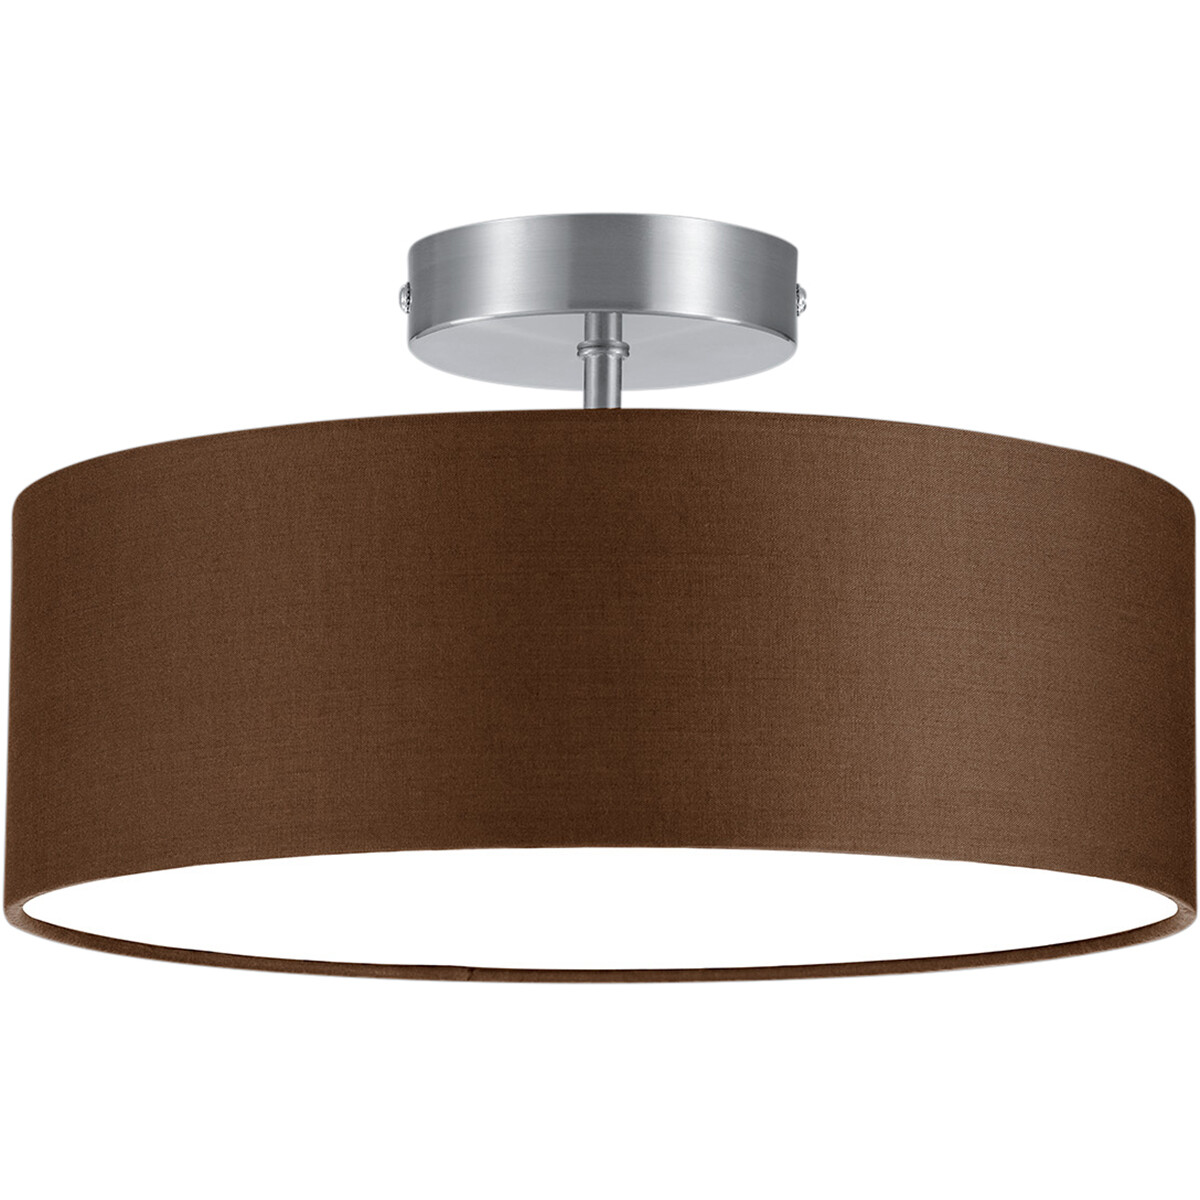 LED Plafondlamp - Plafondverlichting - Trion Hotia - E14 Fitting - 2-lichts - Rond - Mat Bruin - Alu